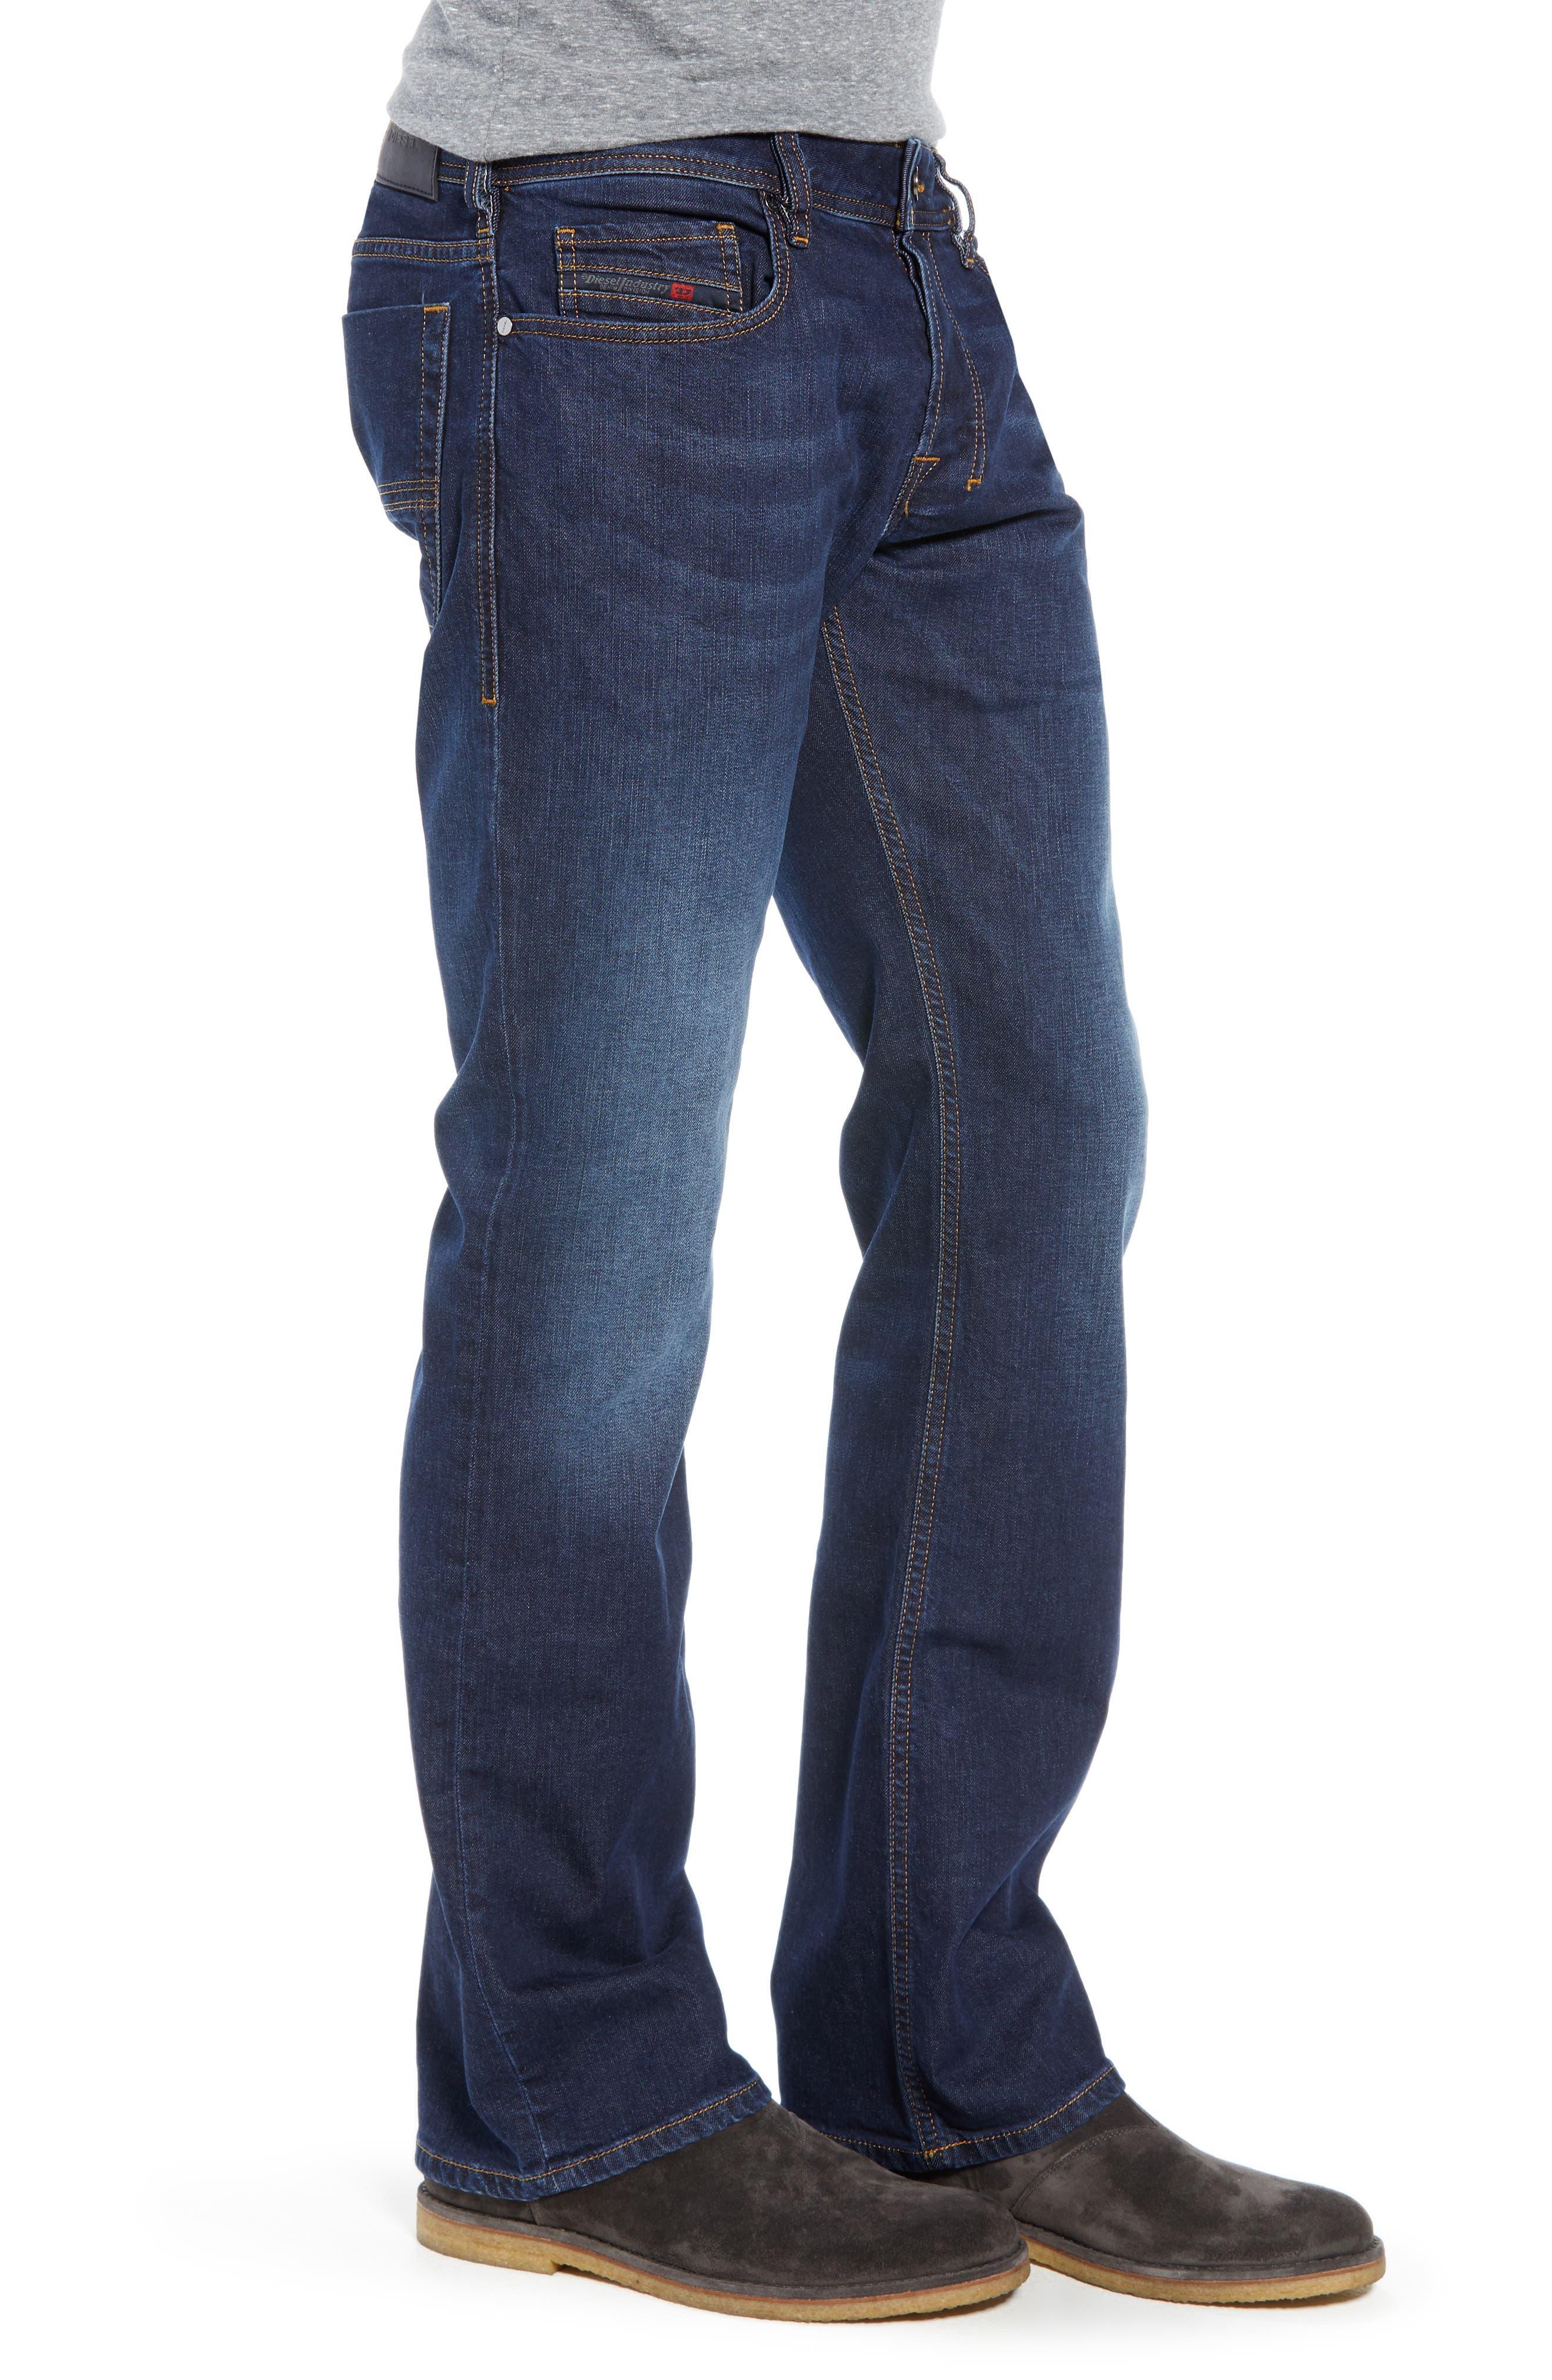 Zatiny Bootcut Jeans,                             Alternate thumbnail 3, color,                             084XH